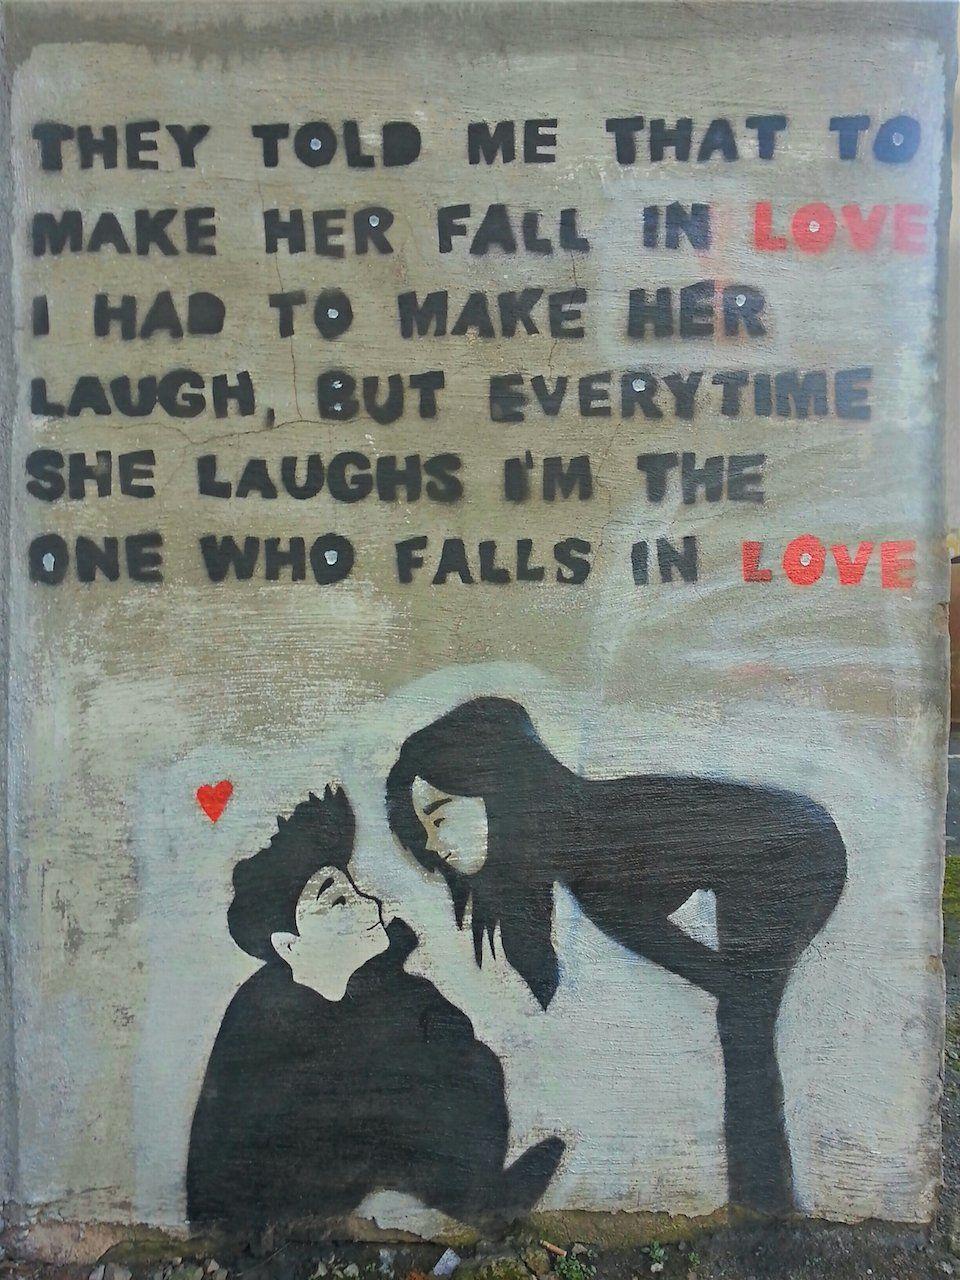 Street Art in Chorley, England - Make Her Laugh